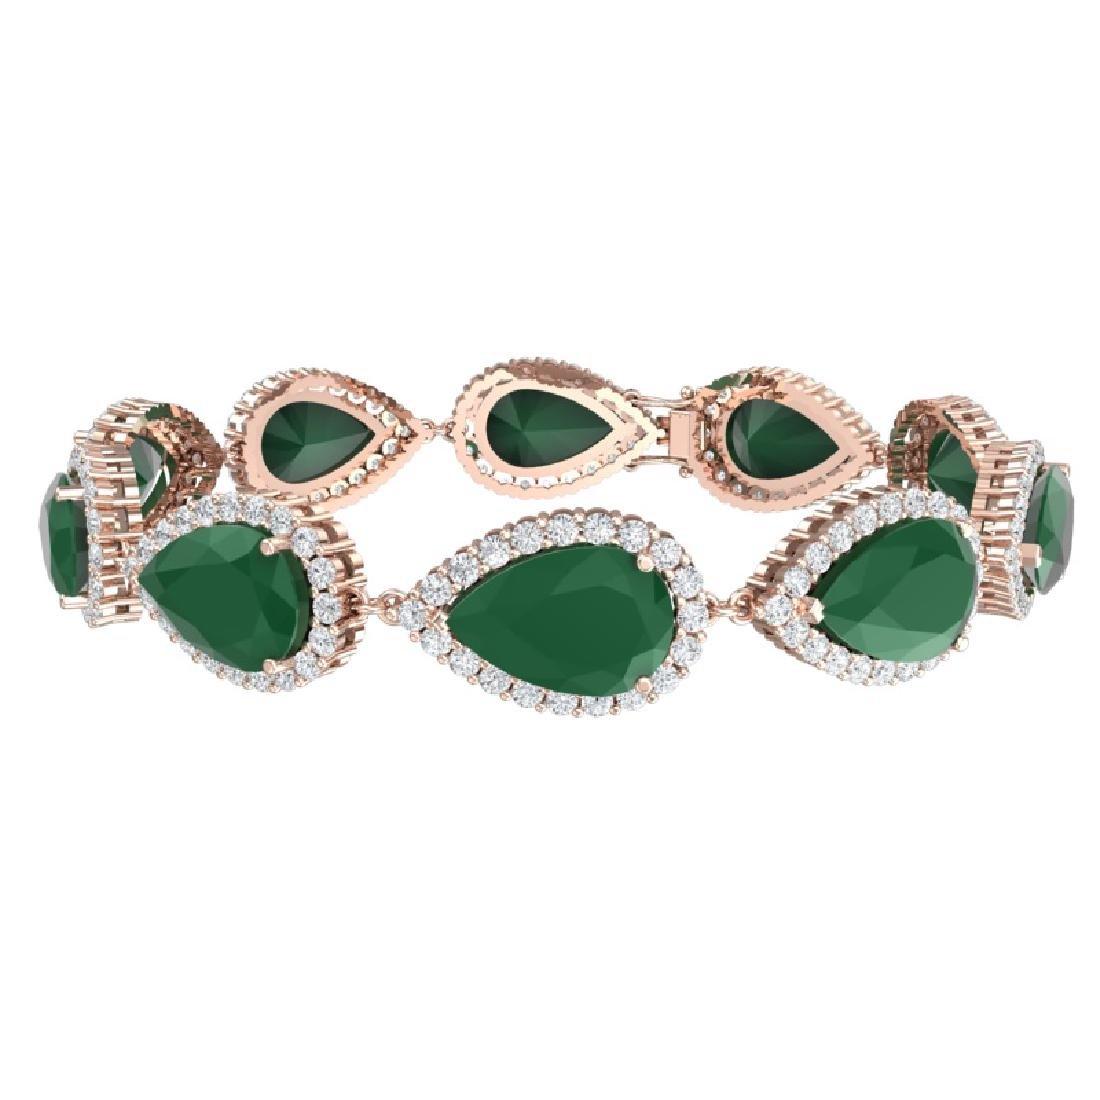 42 CTW Royalty Emerald & VS Diamond Bracelet 18K Rose - 3